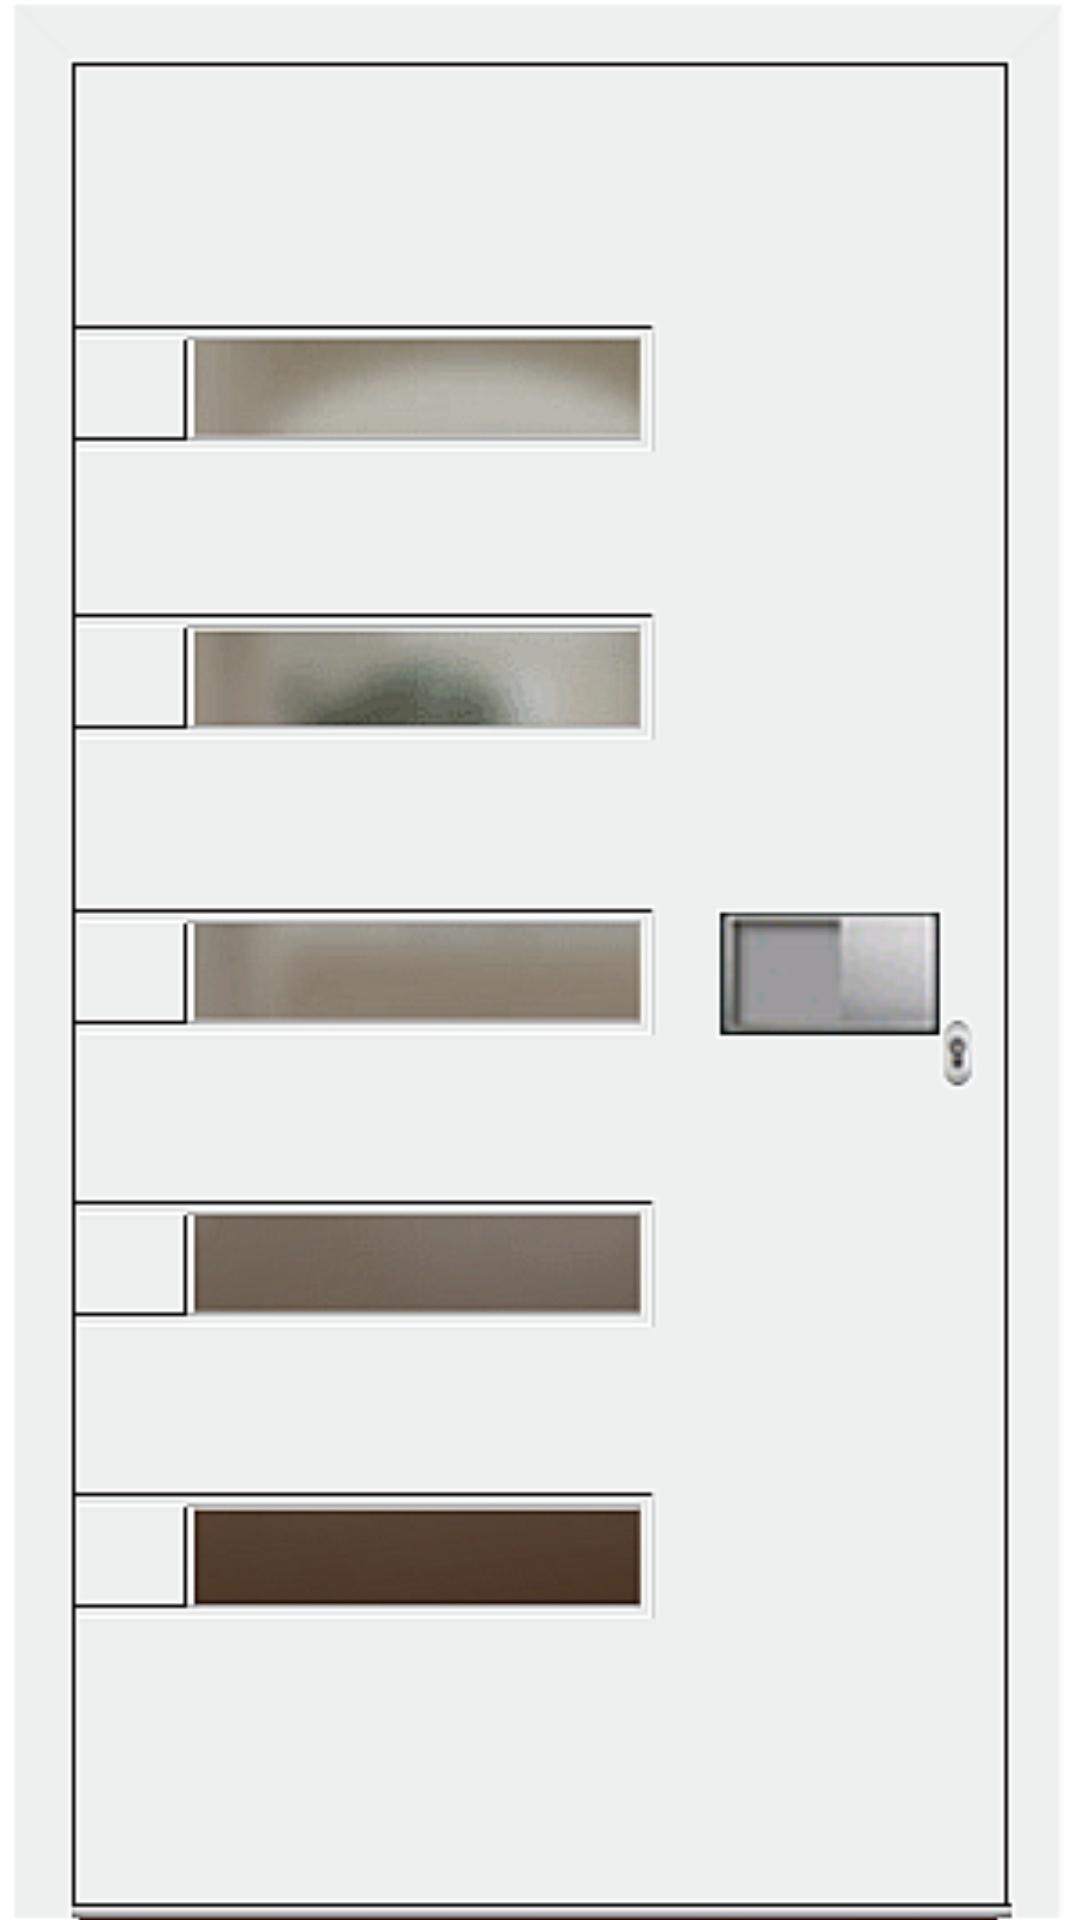 Aluminium Haustür Modell 6188-52 weiß